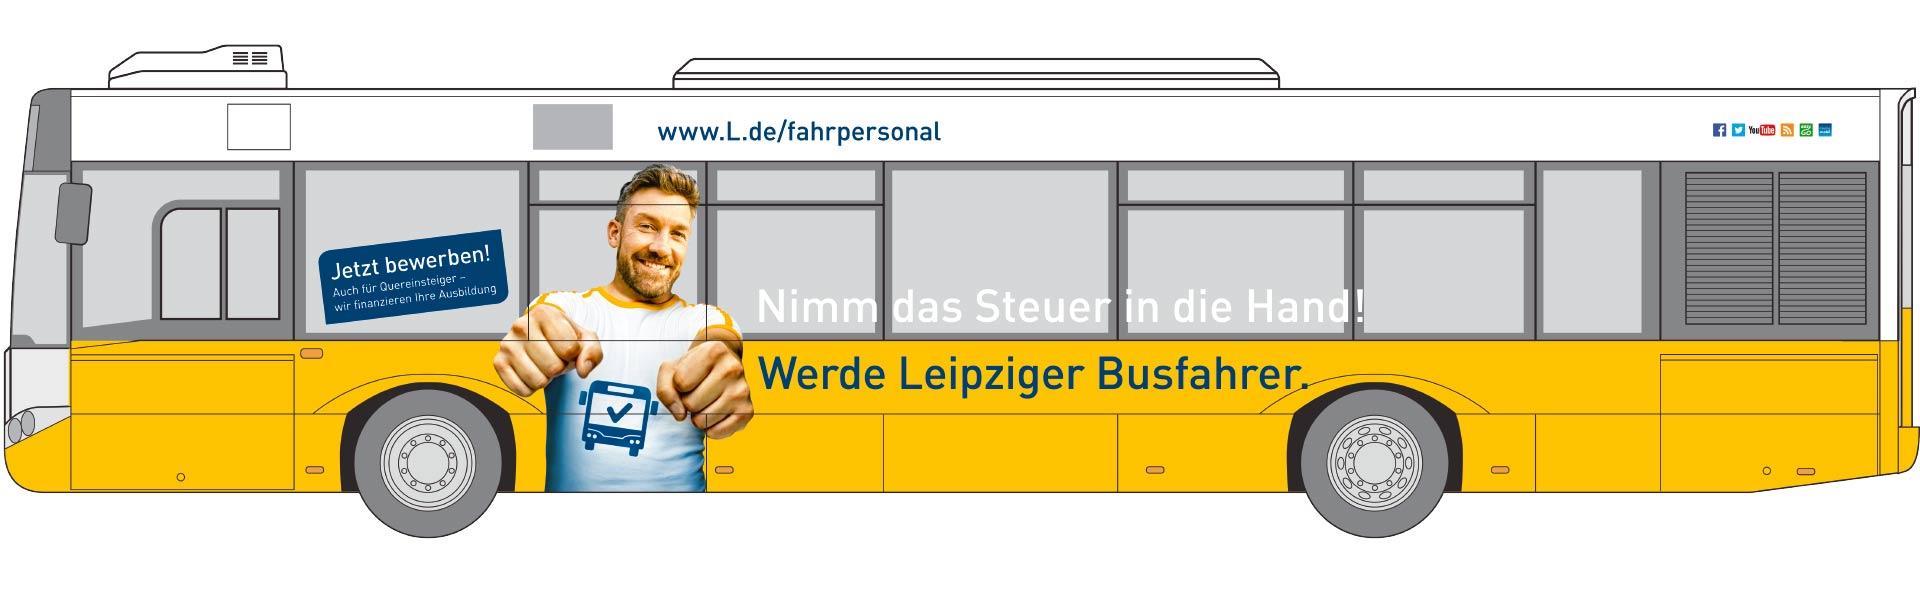 Simulation Bus-Werbung Busfahrer